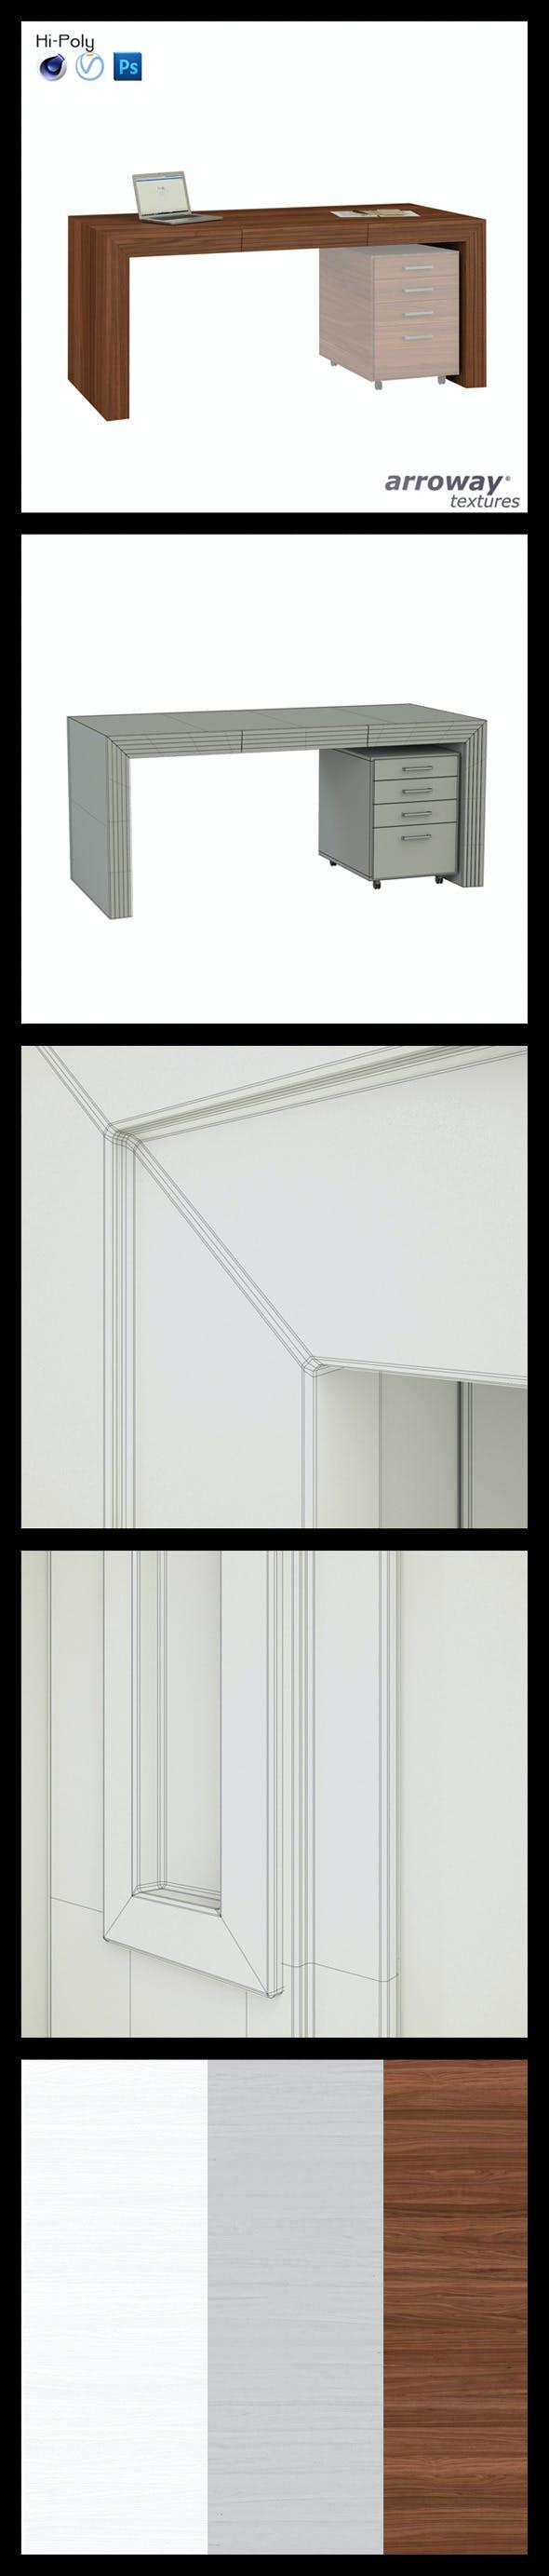 Triant Brown 501 Hi-Poly - 3DOcean Item for Sale